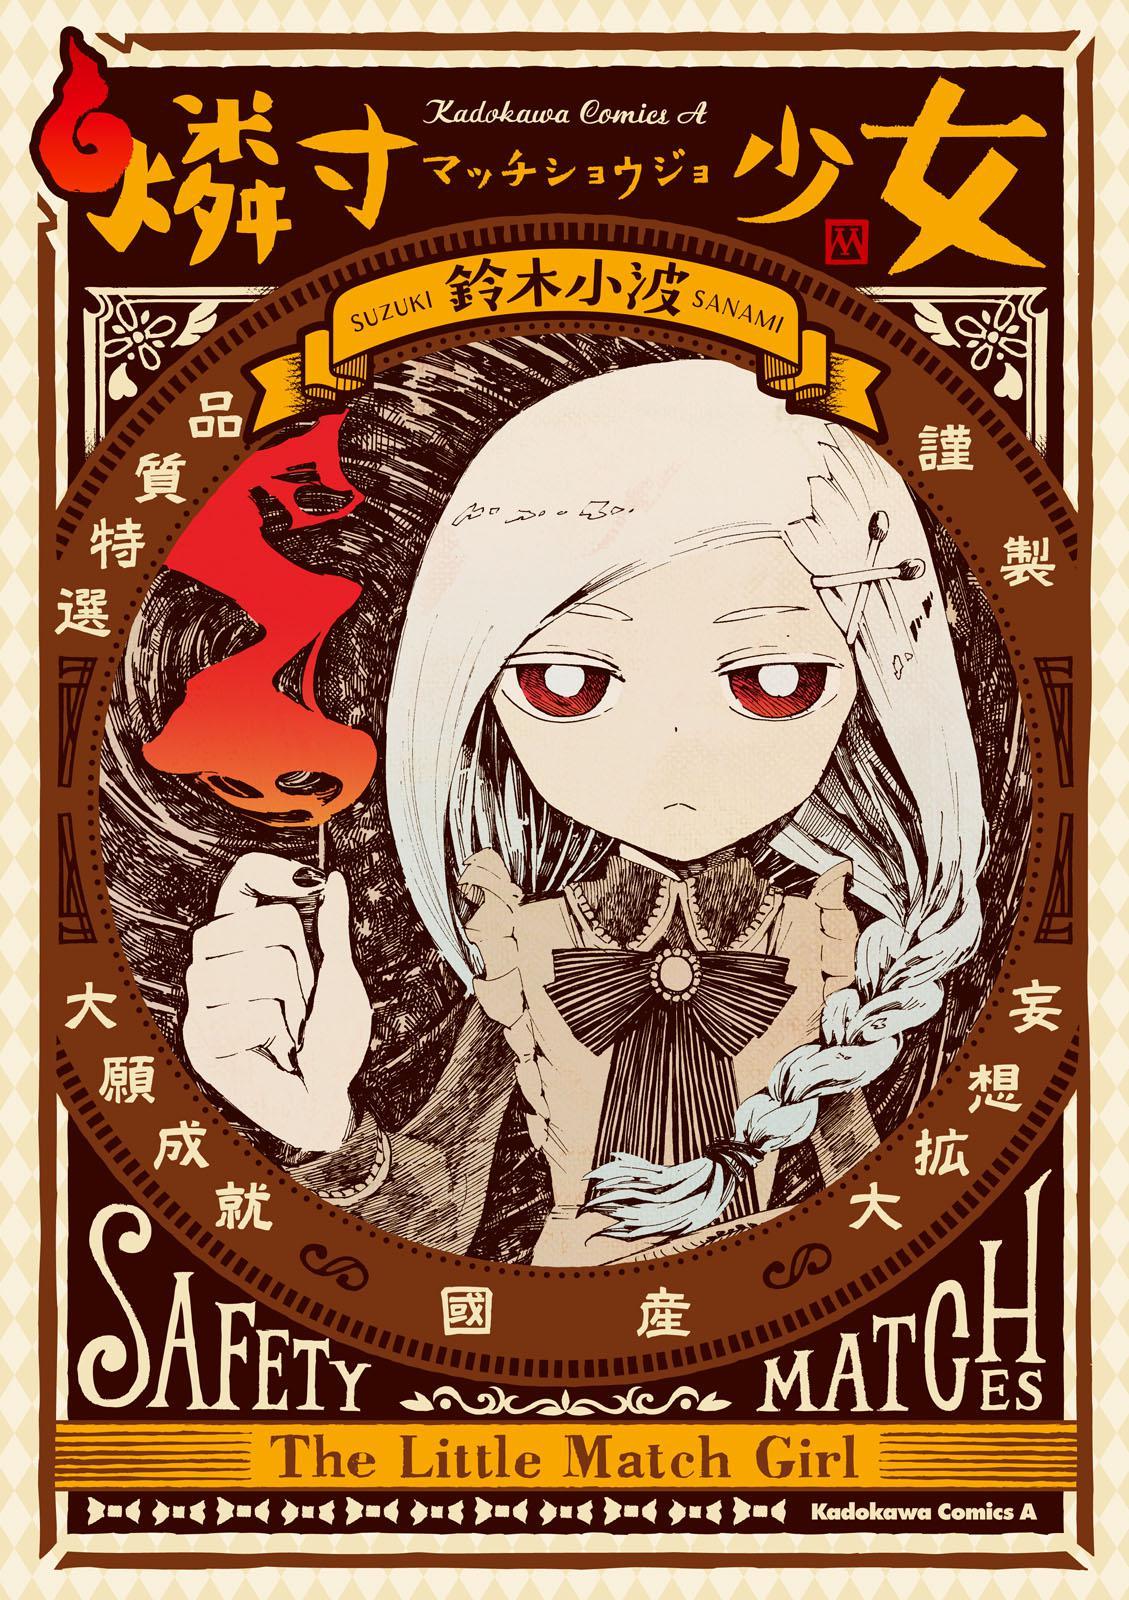 https://c5.ninemanga.com/es_manga/27/17755/472475/a020fd47fd55f6839c2ea86c903a0abc.jpg Page 1